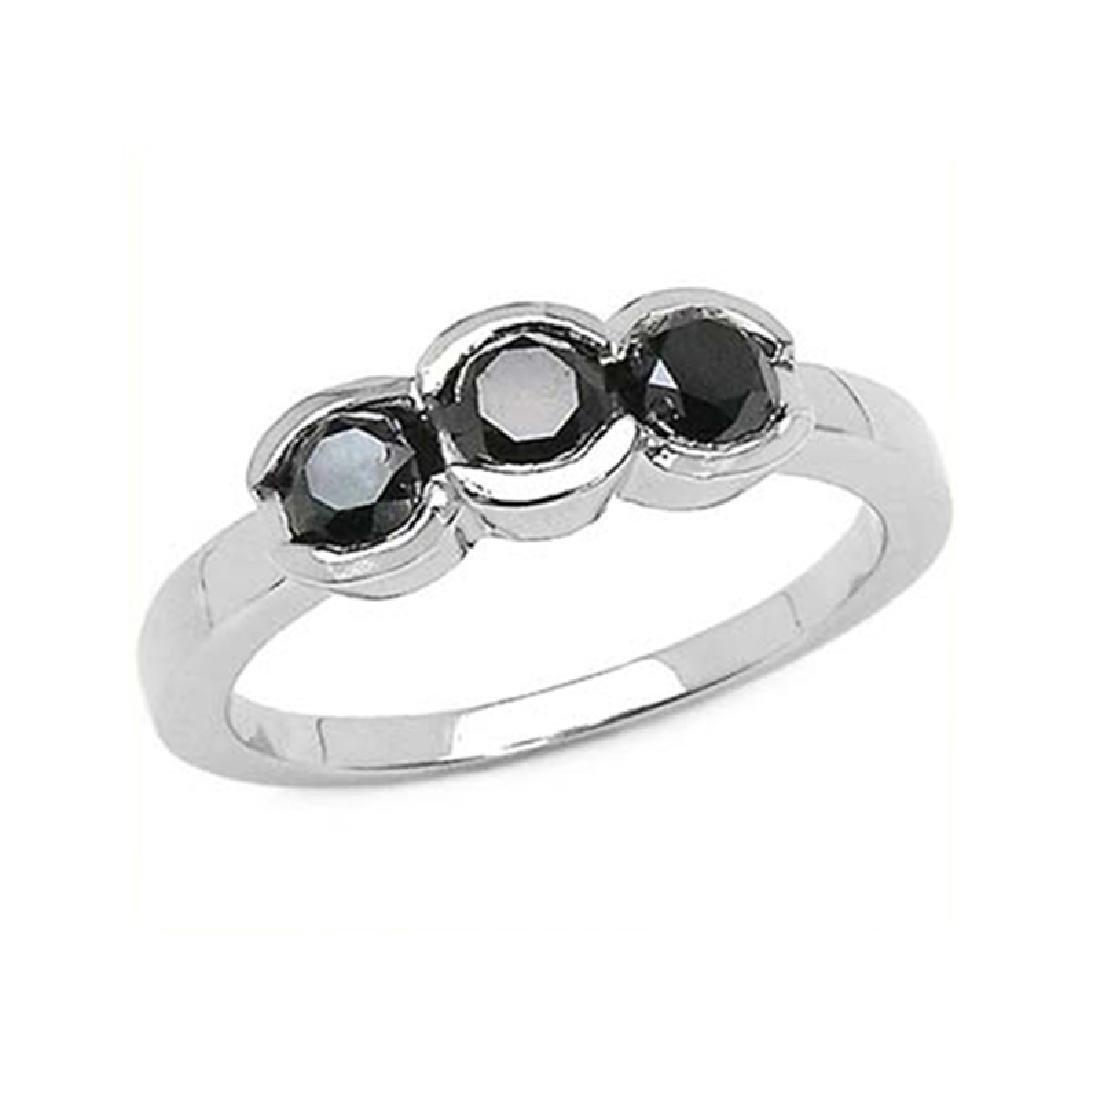 *Fine Jewelry 1.16CT Round Cut Black Diamond And